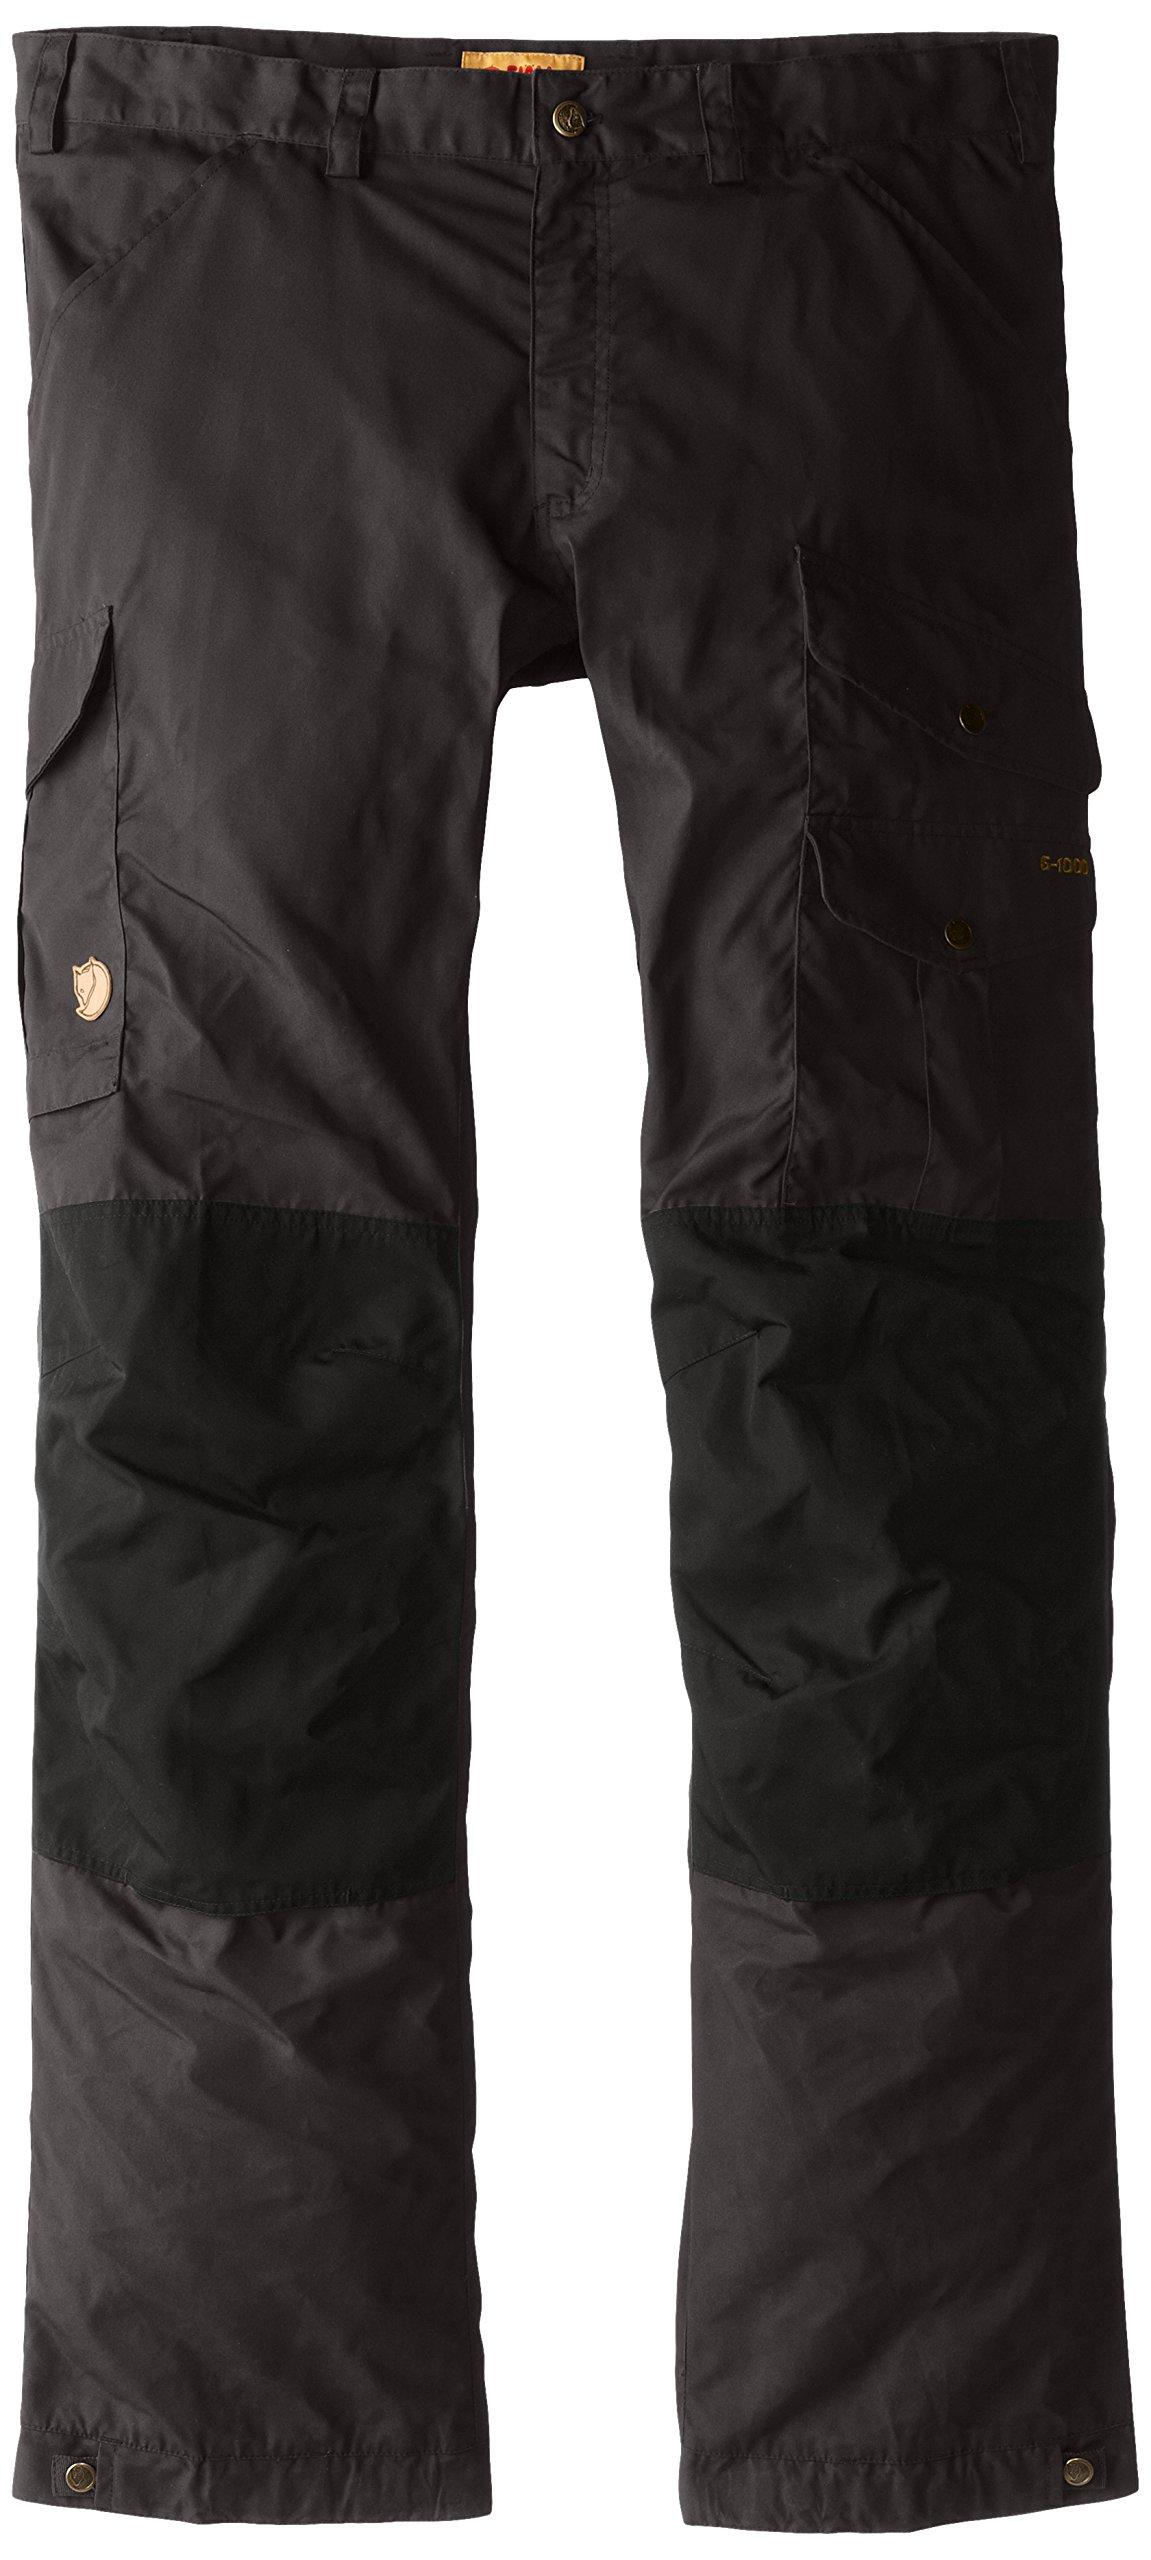 Fjallraven Men's Vidda Pro Trousers Regular, Dark Grey/Black, 58